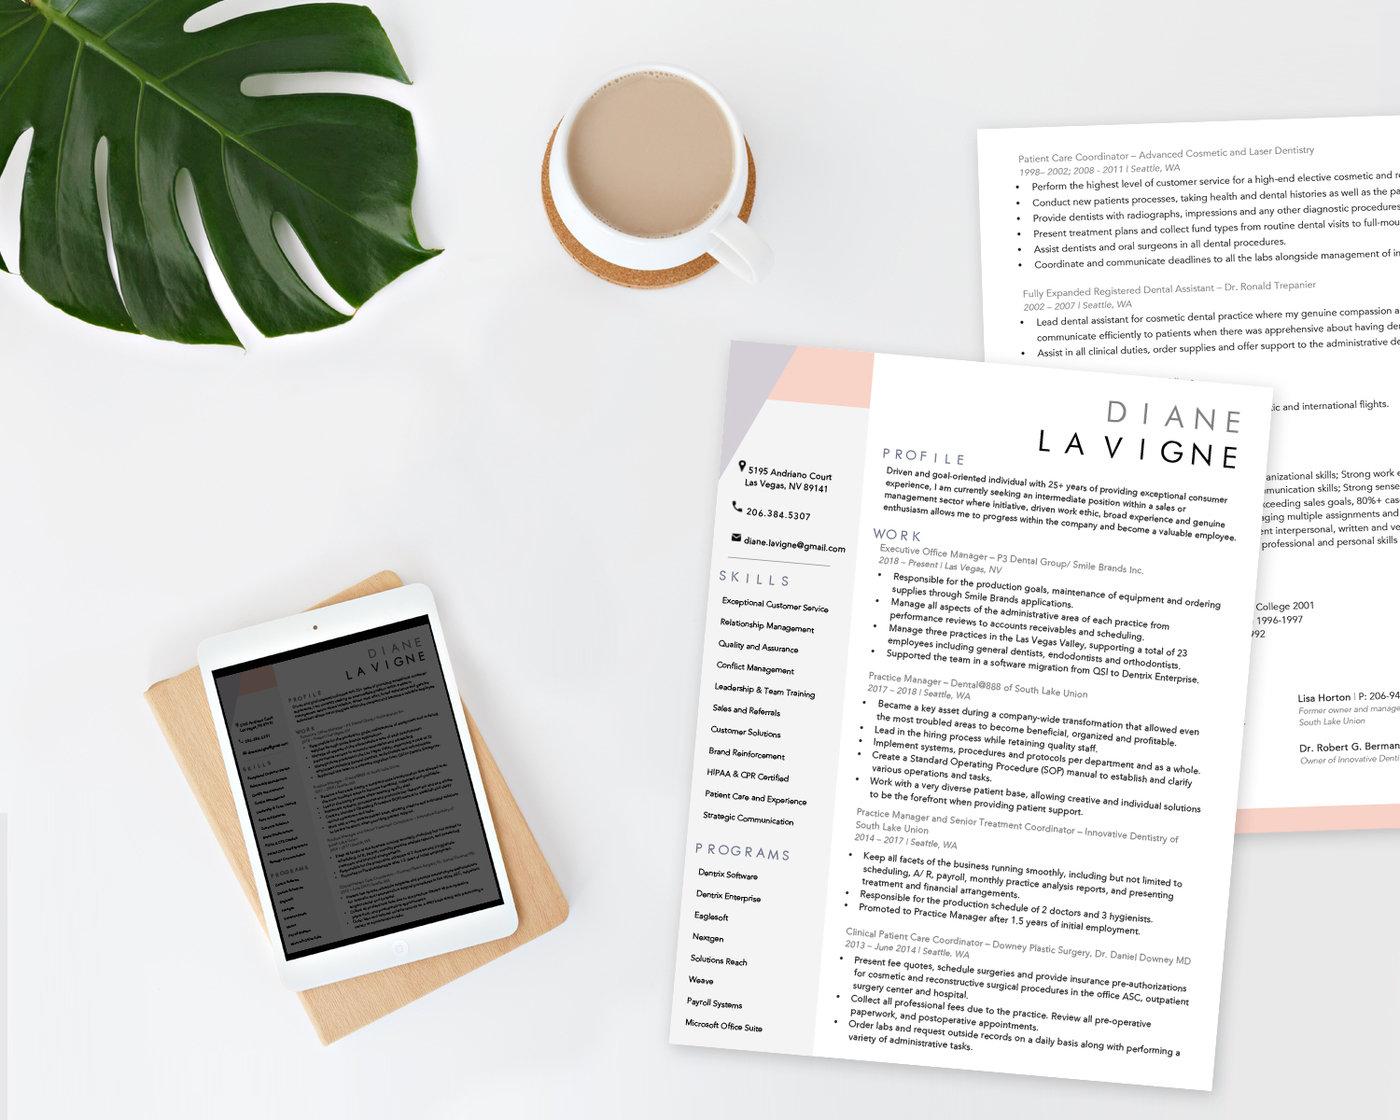 Creative Resume By Diana Knopinski At Coroflot Com